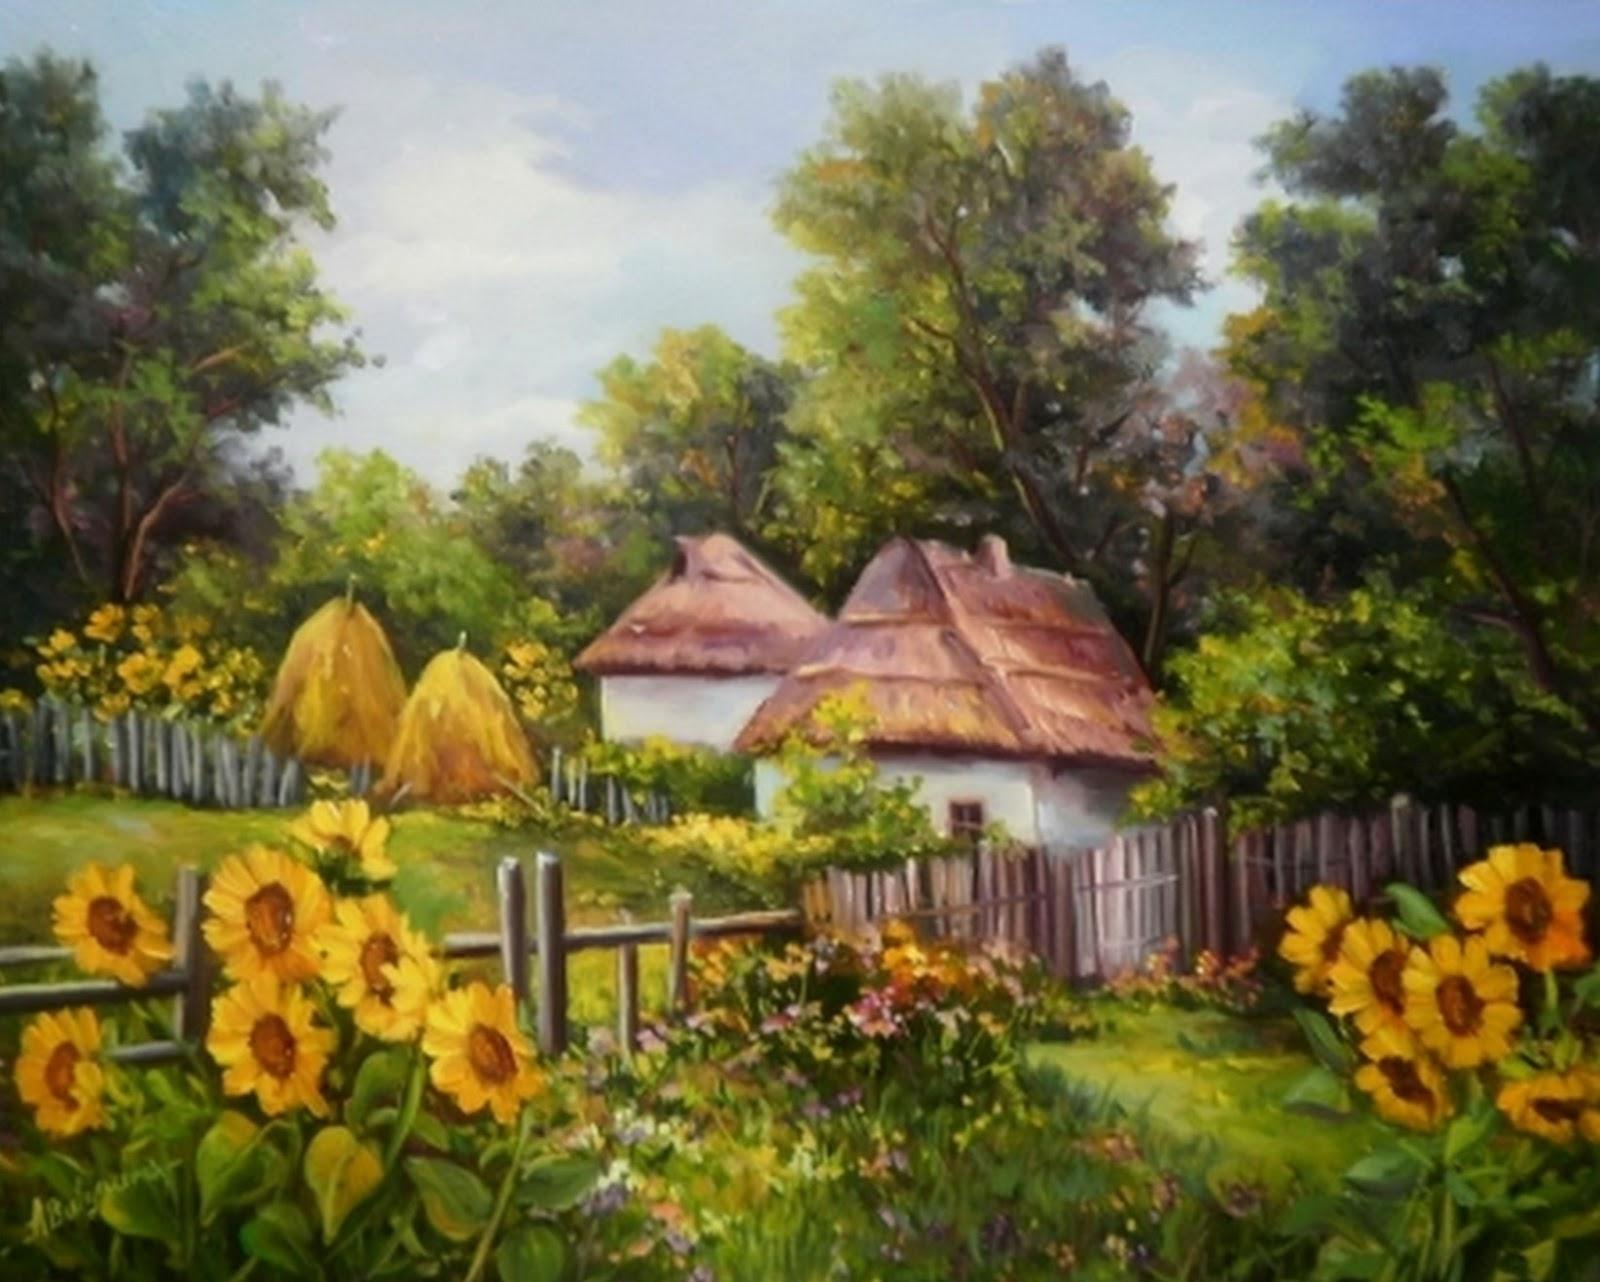 Pinturas cuadros lienzos paisajes costumbristas pintados for Cuadros pintados al oleo